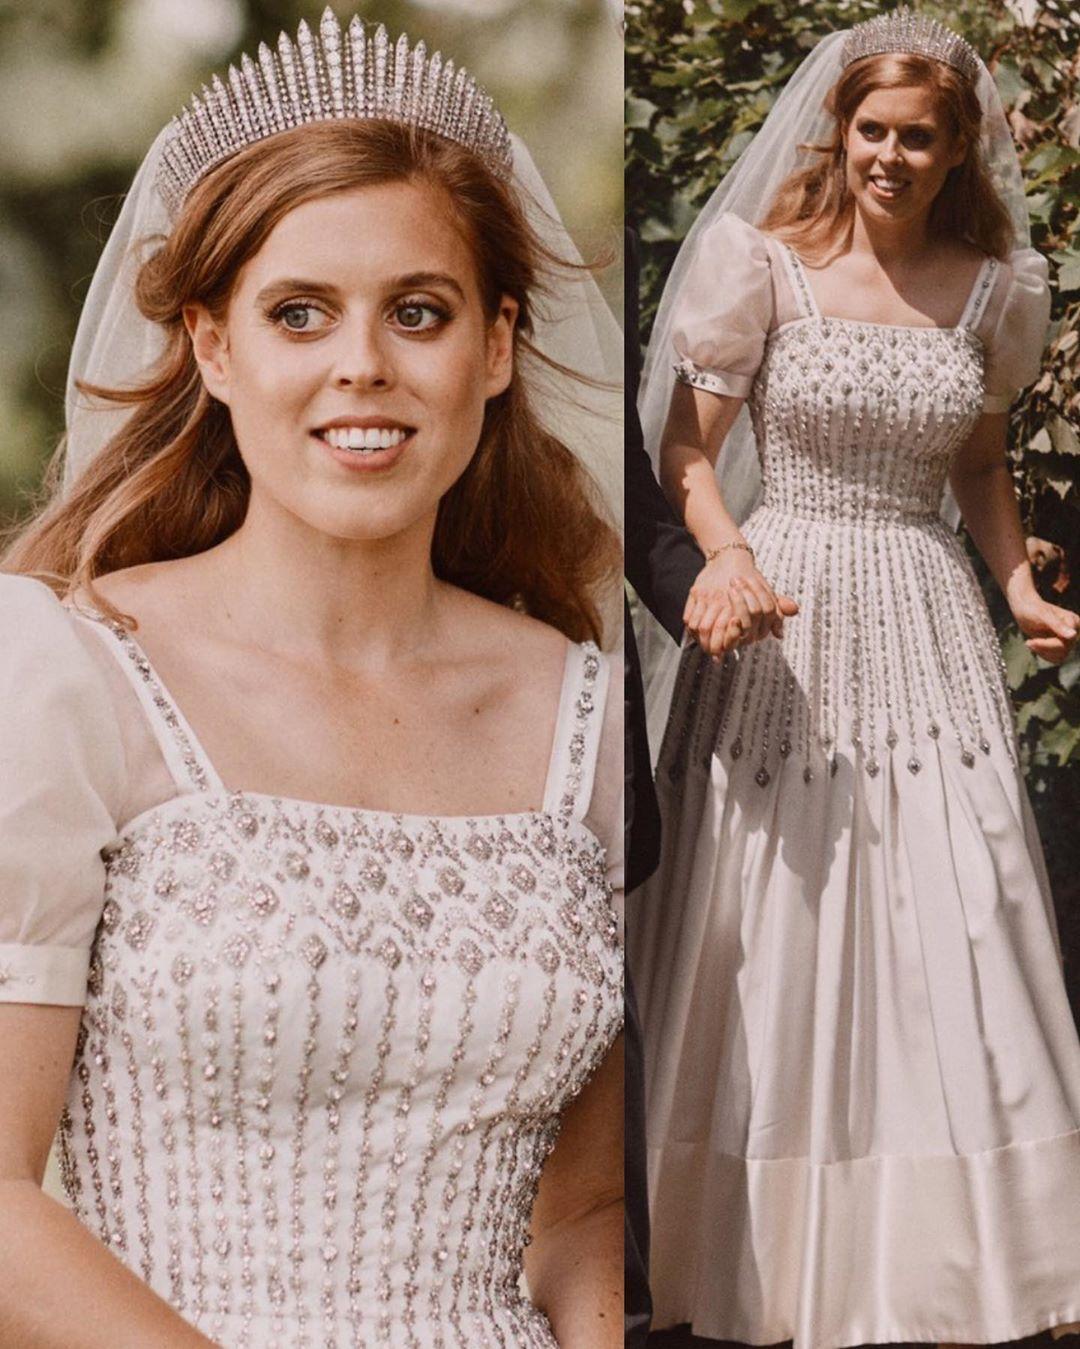 Royal Families Of Europe Heeft Iets Geplaatst Op Instagram Do You Like Her Wedding Dress Royal Wedding Gowns Princess Beatrice Wedding Royal Brides [ 1349 x 1080 Pixel ]